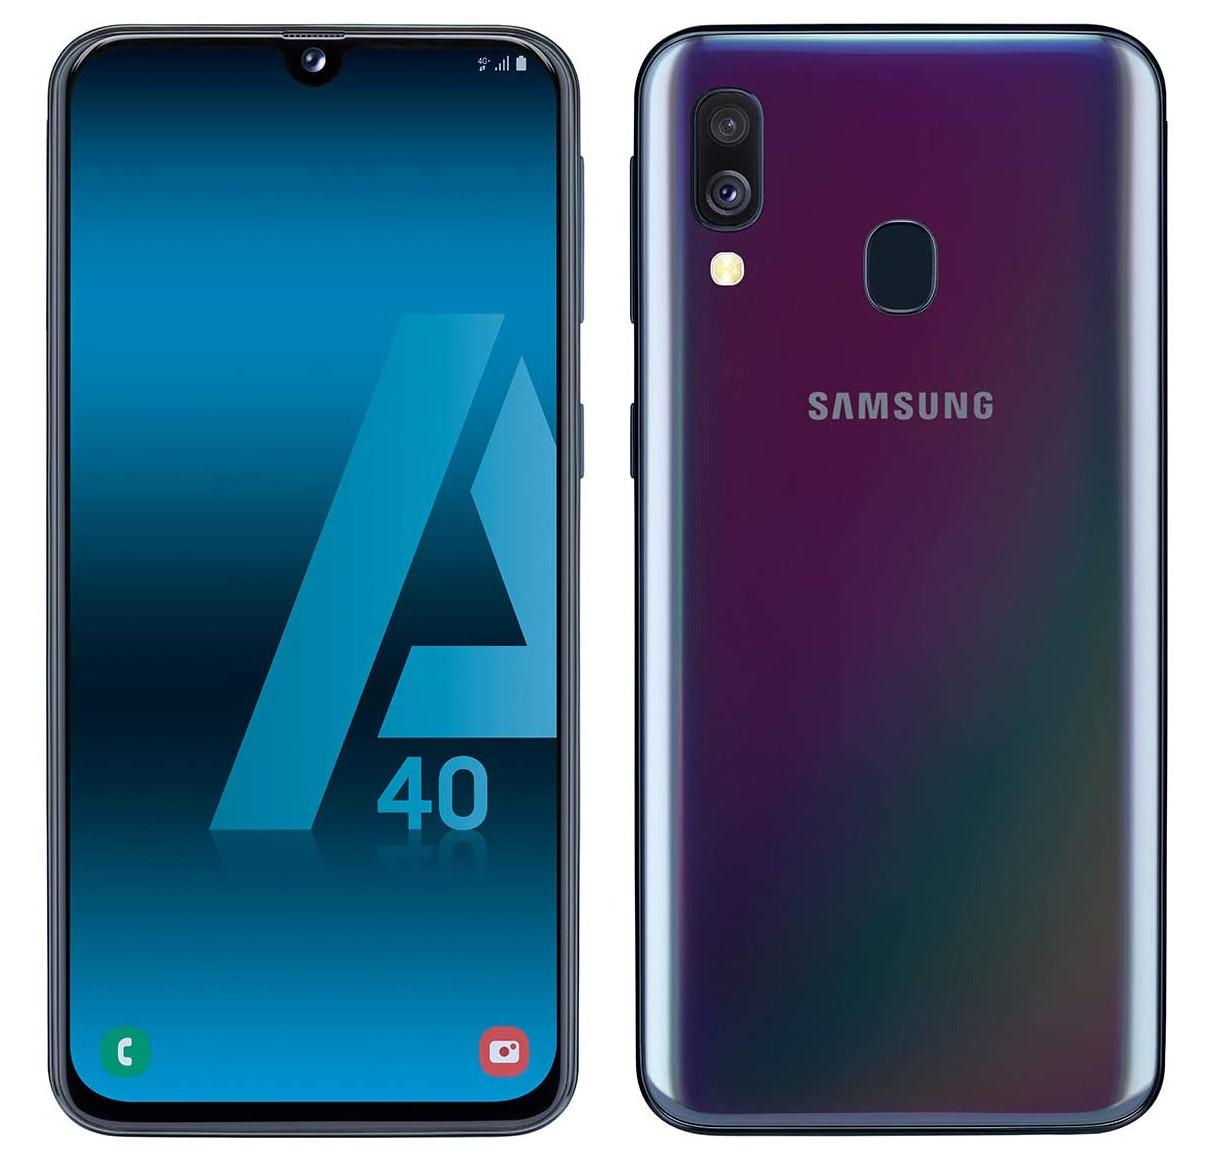 "Samsung Galaxy A40 5.9"" 64GB SIM Free Unlocked Smartphone Black - Spanish Version - £143.76 delivered @ Amazon"